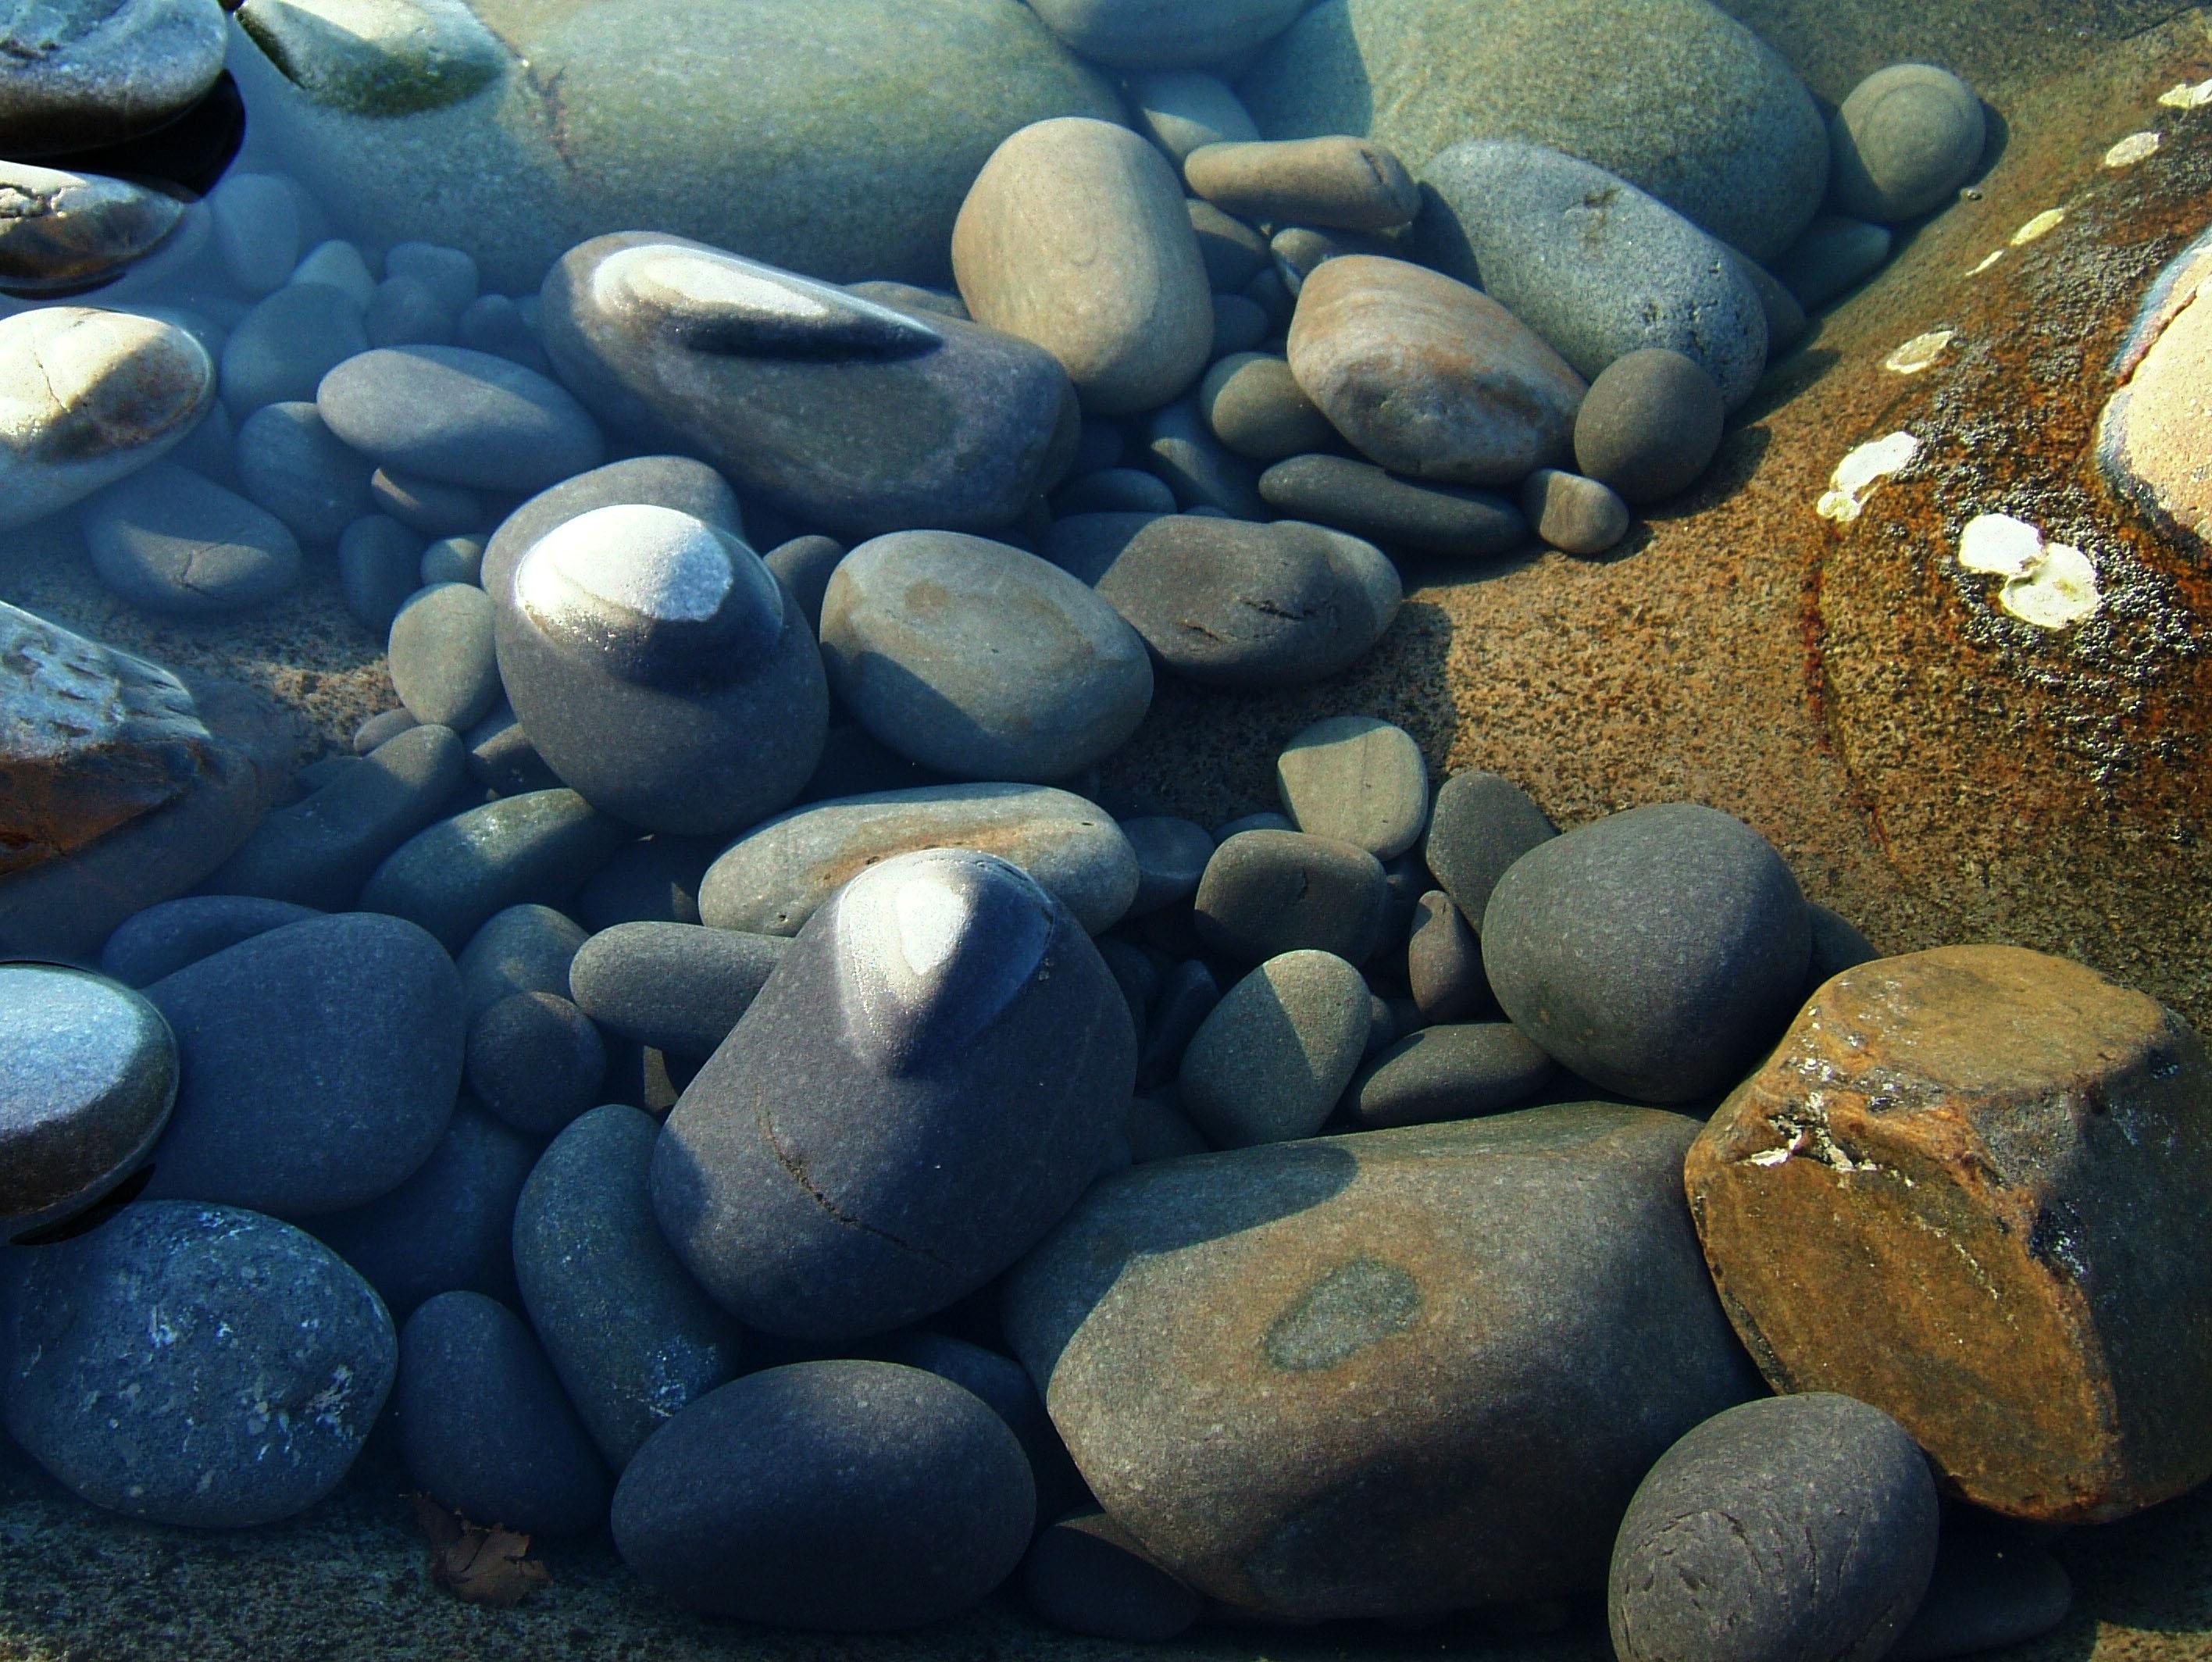 Textures Stones Pebbles Noosa National Park 06